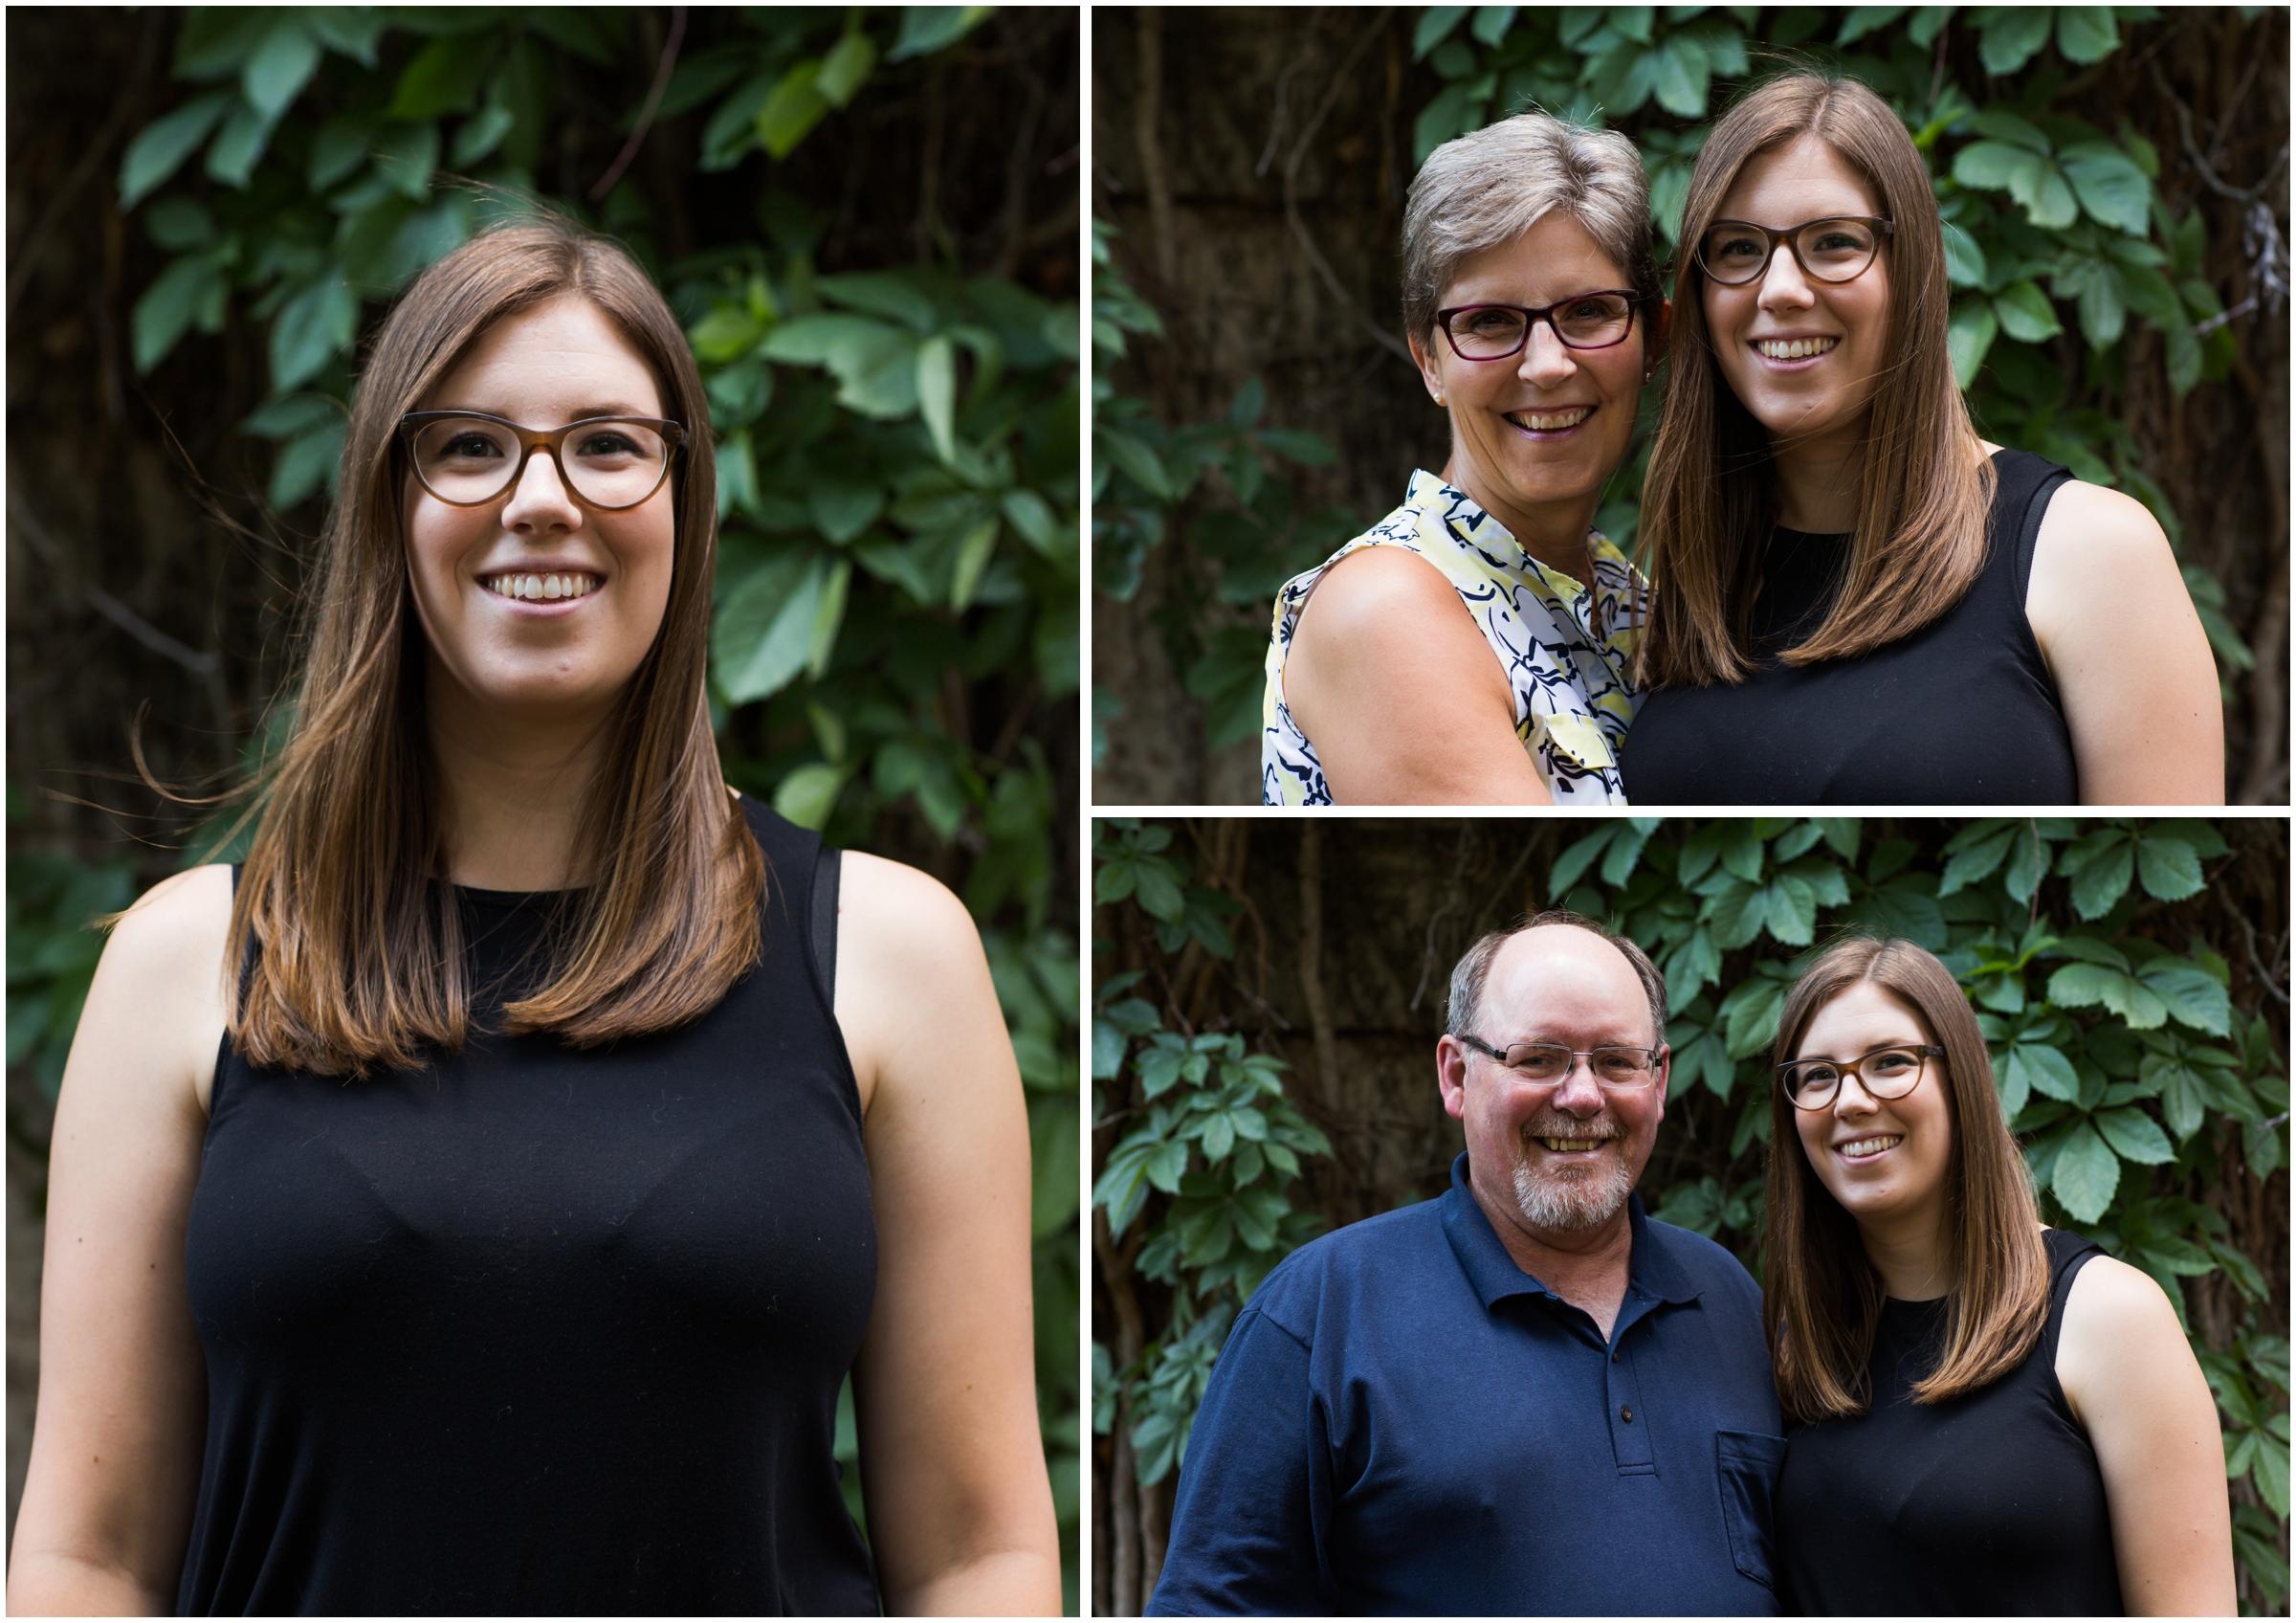 Edmonton Family Photo Session - (Selena Phillips-Boyle)_0009.jpg